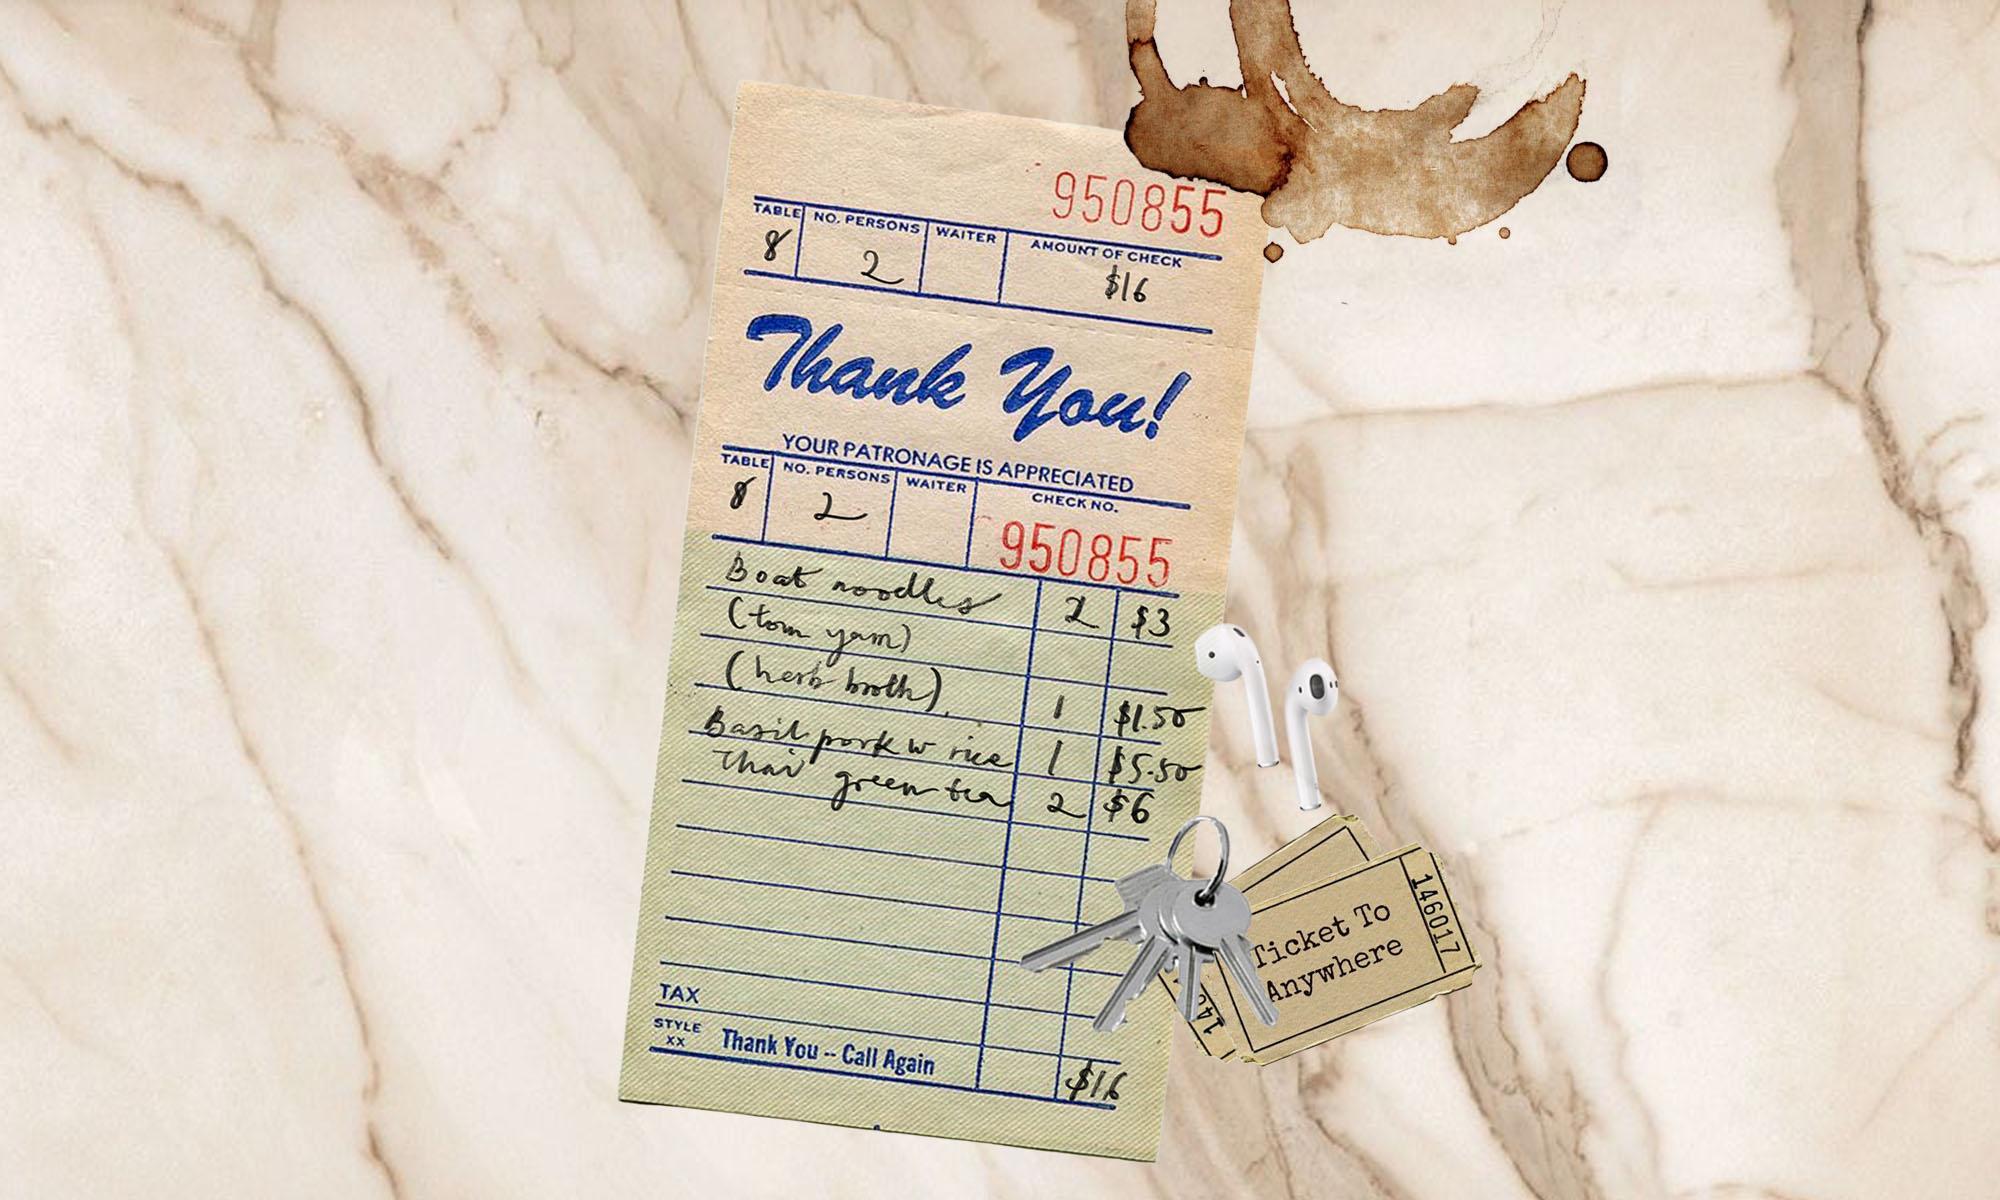 Money diary of a writer in Singapore - WILDCHILD SG